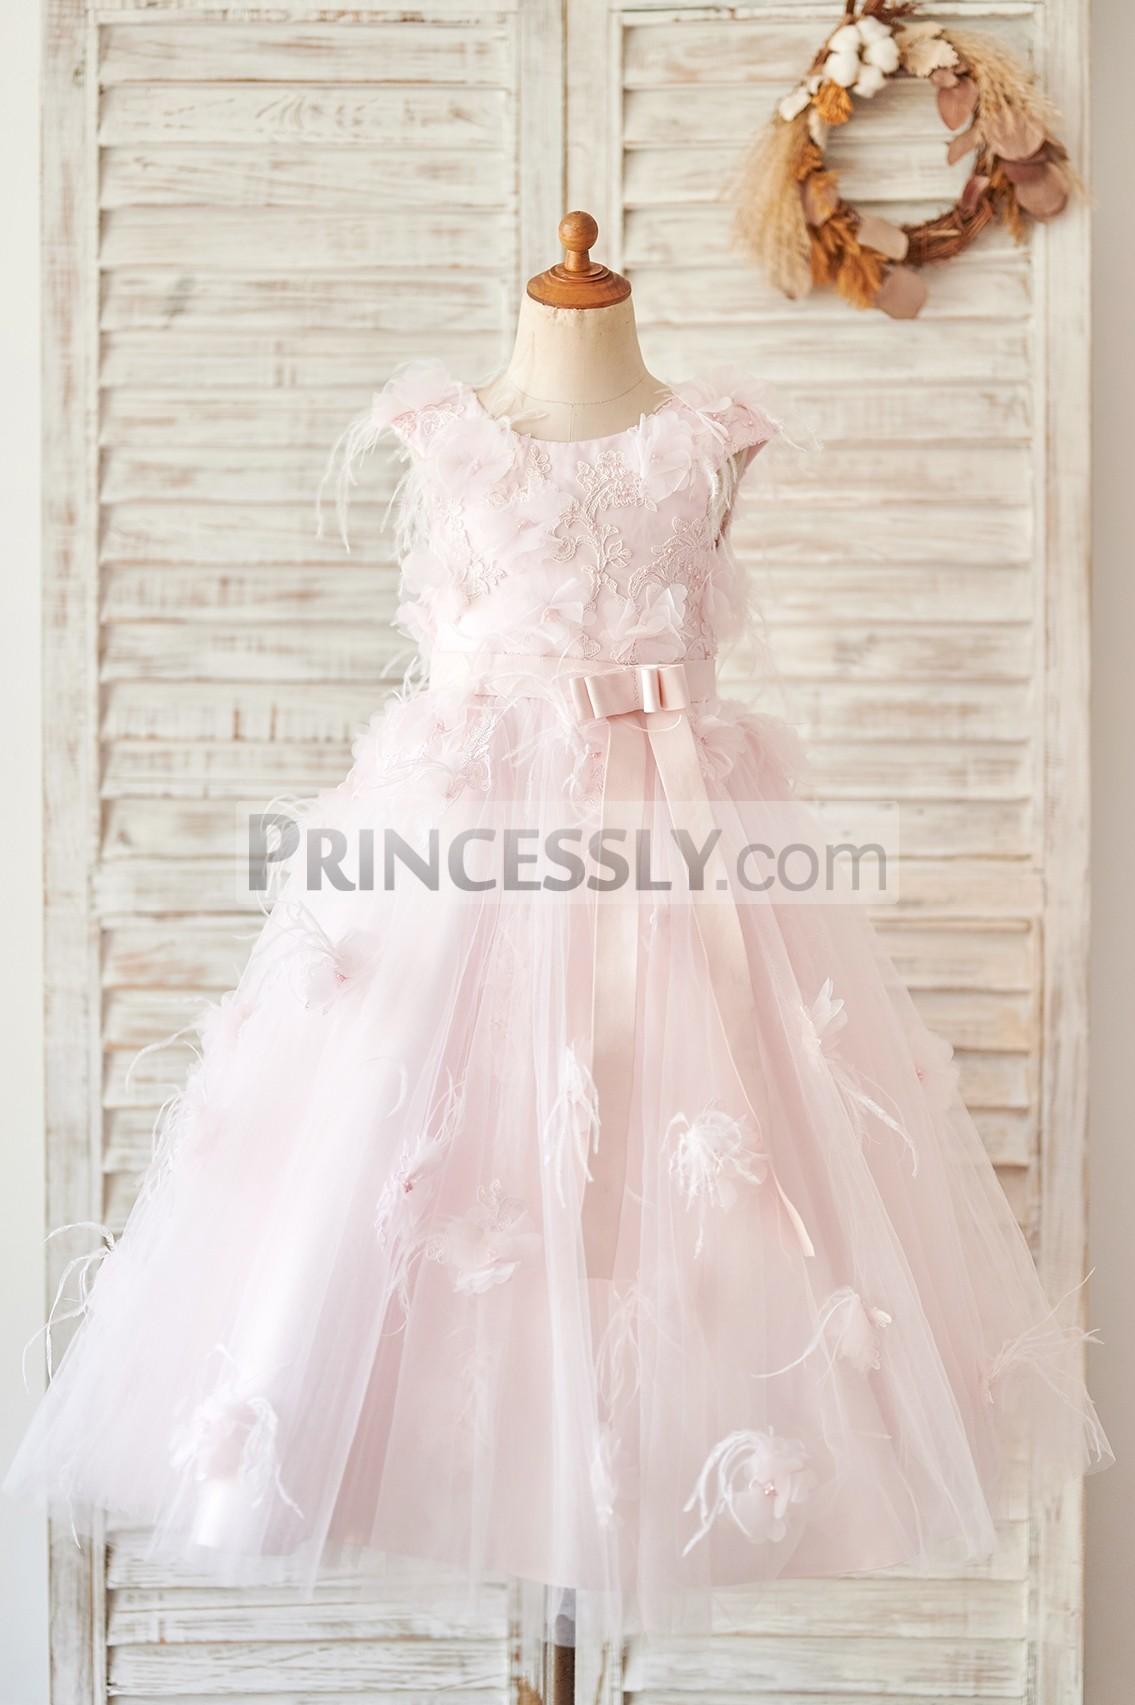 Princessly.com-K1004063-Pink Lace Tulle V Back Wedding Flower Girl Dress with Feather-31